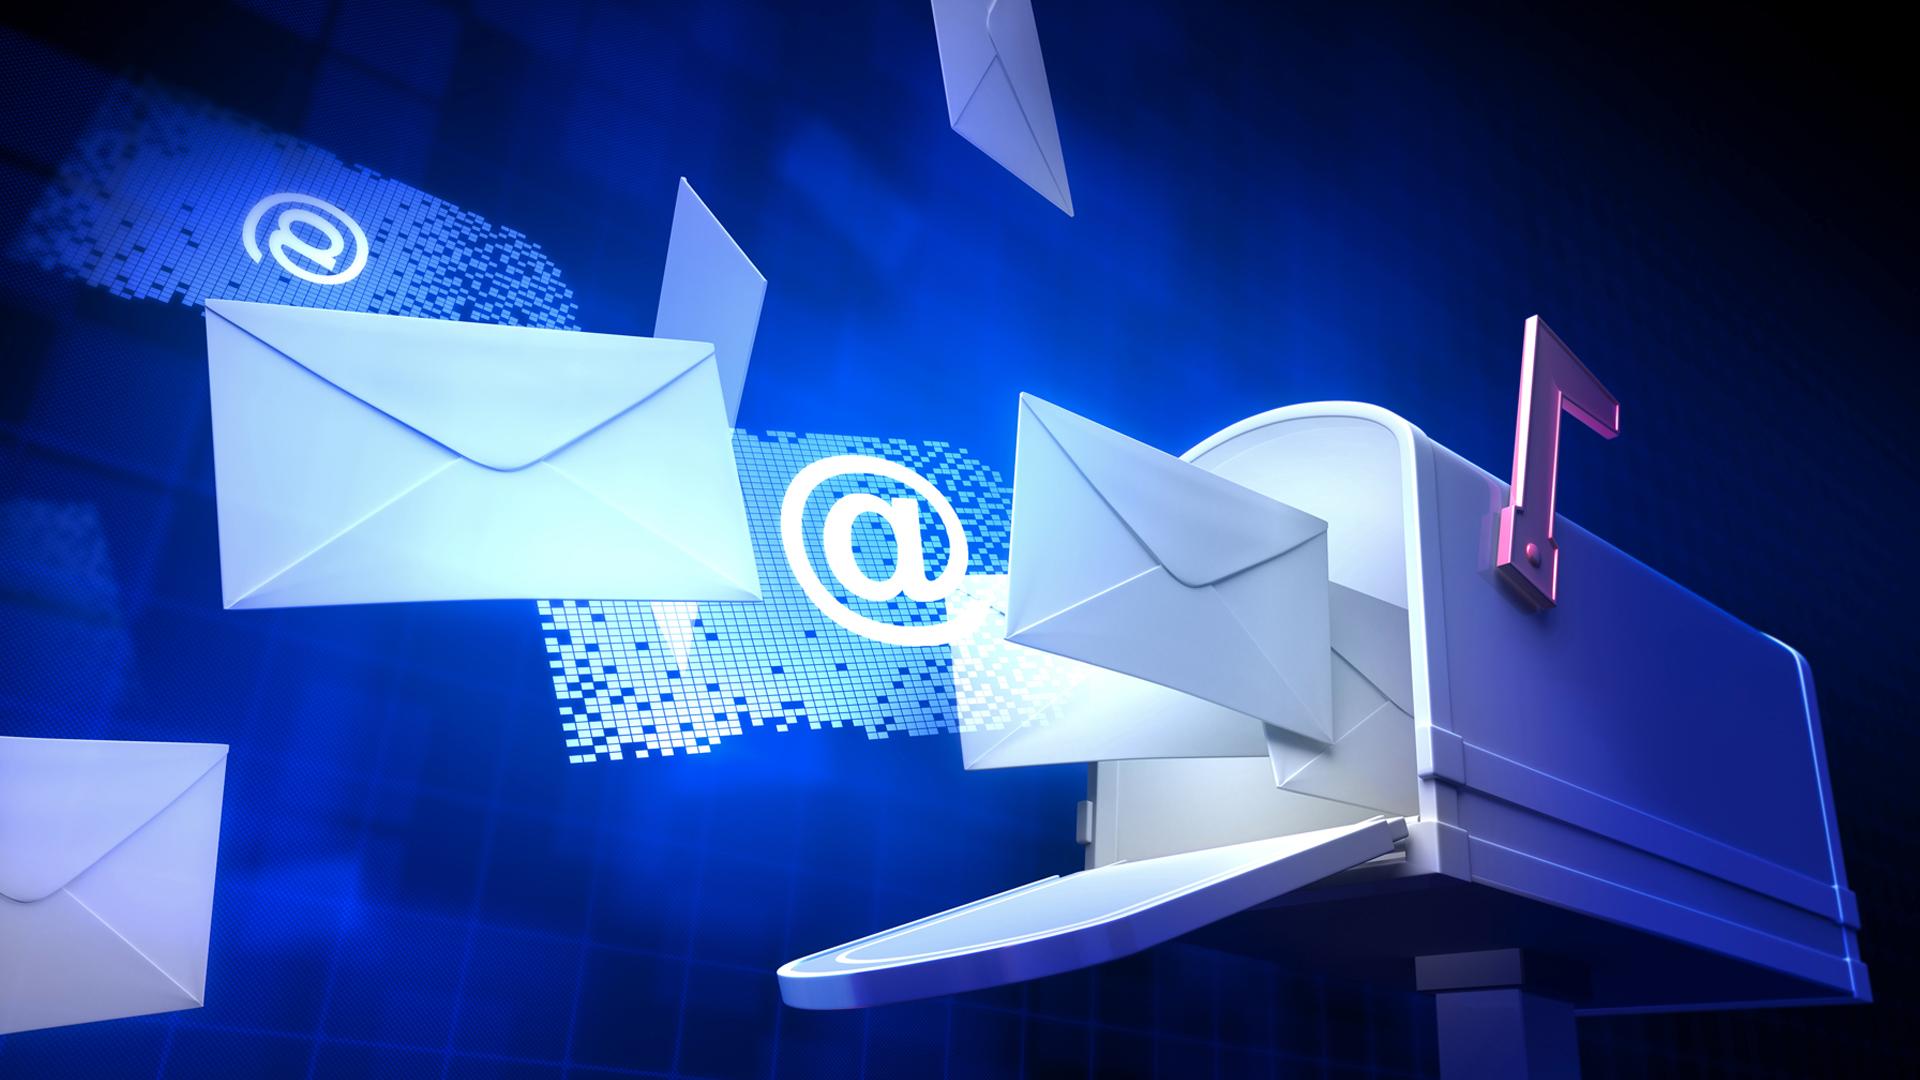 cach viet tieu de email